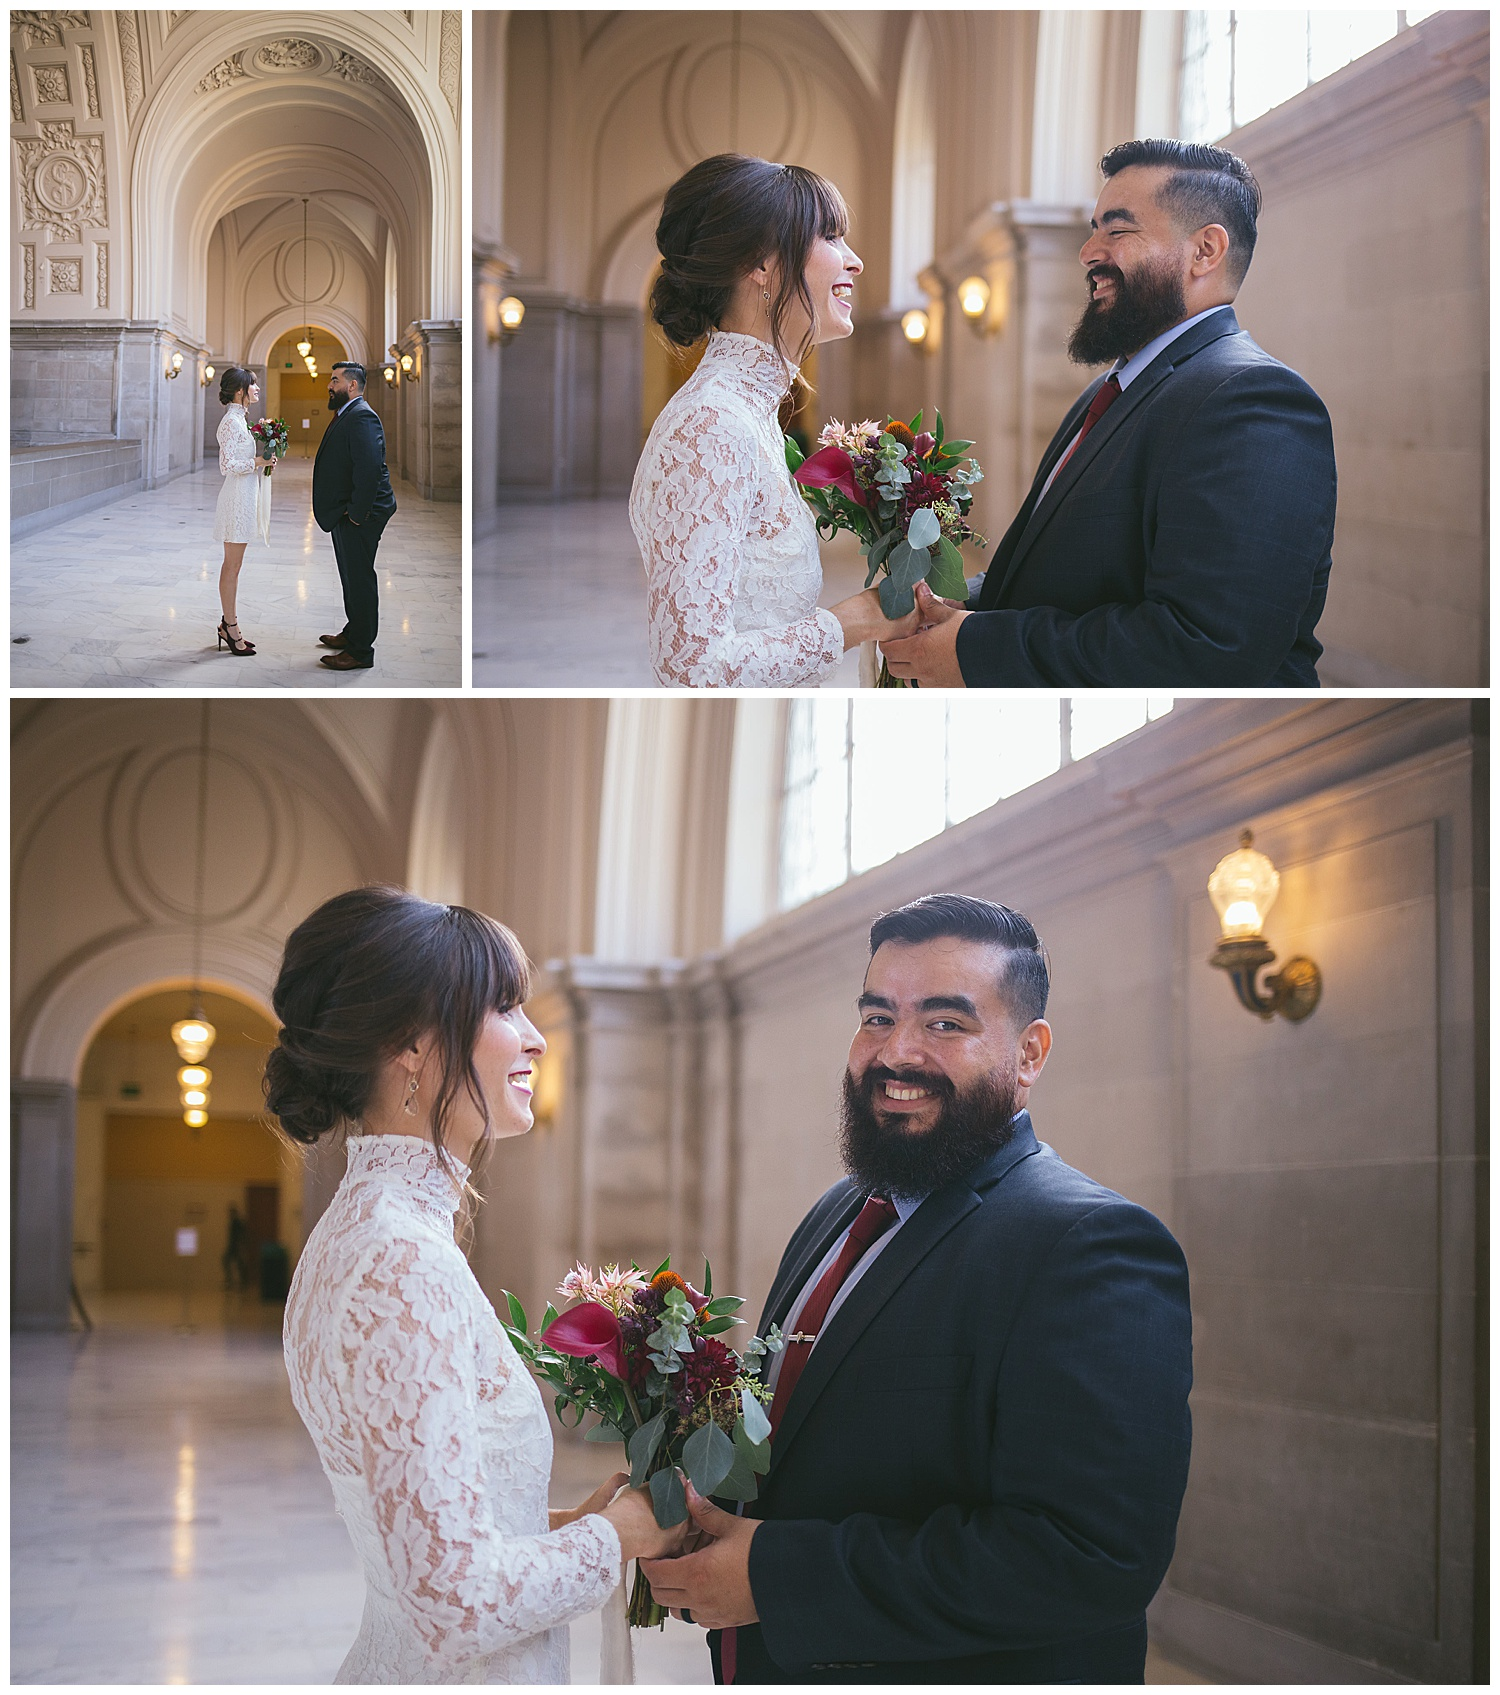 khariza-rae-photography-bay-area-wedding-photographer_0060.jpg